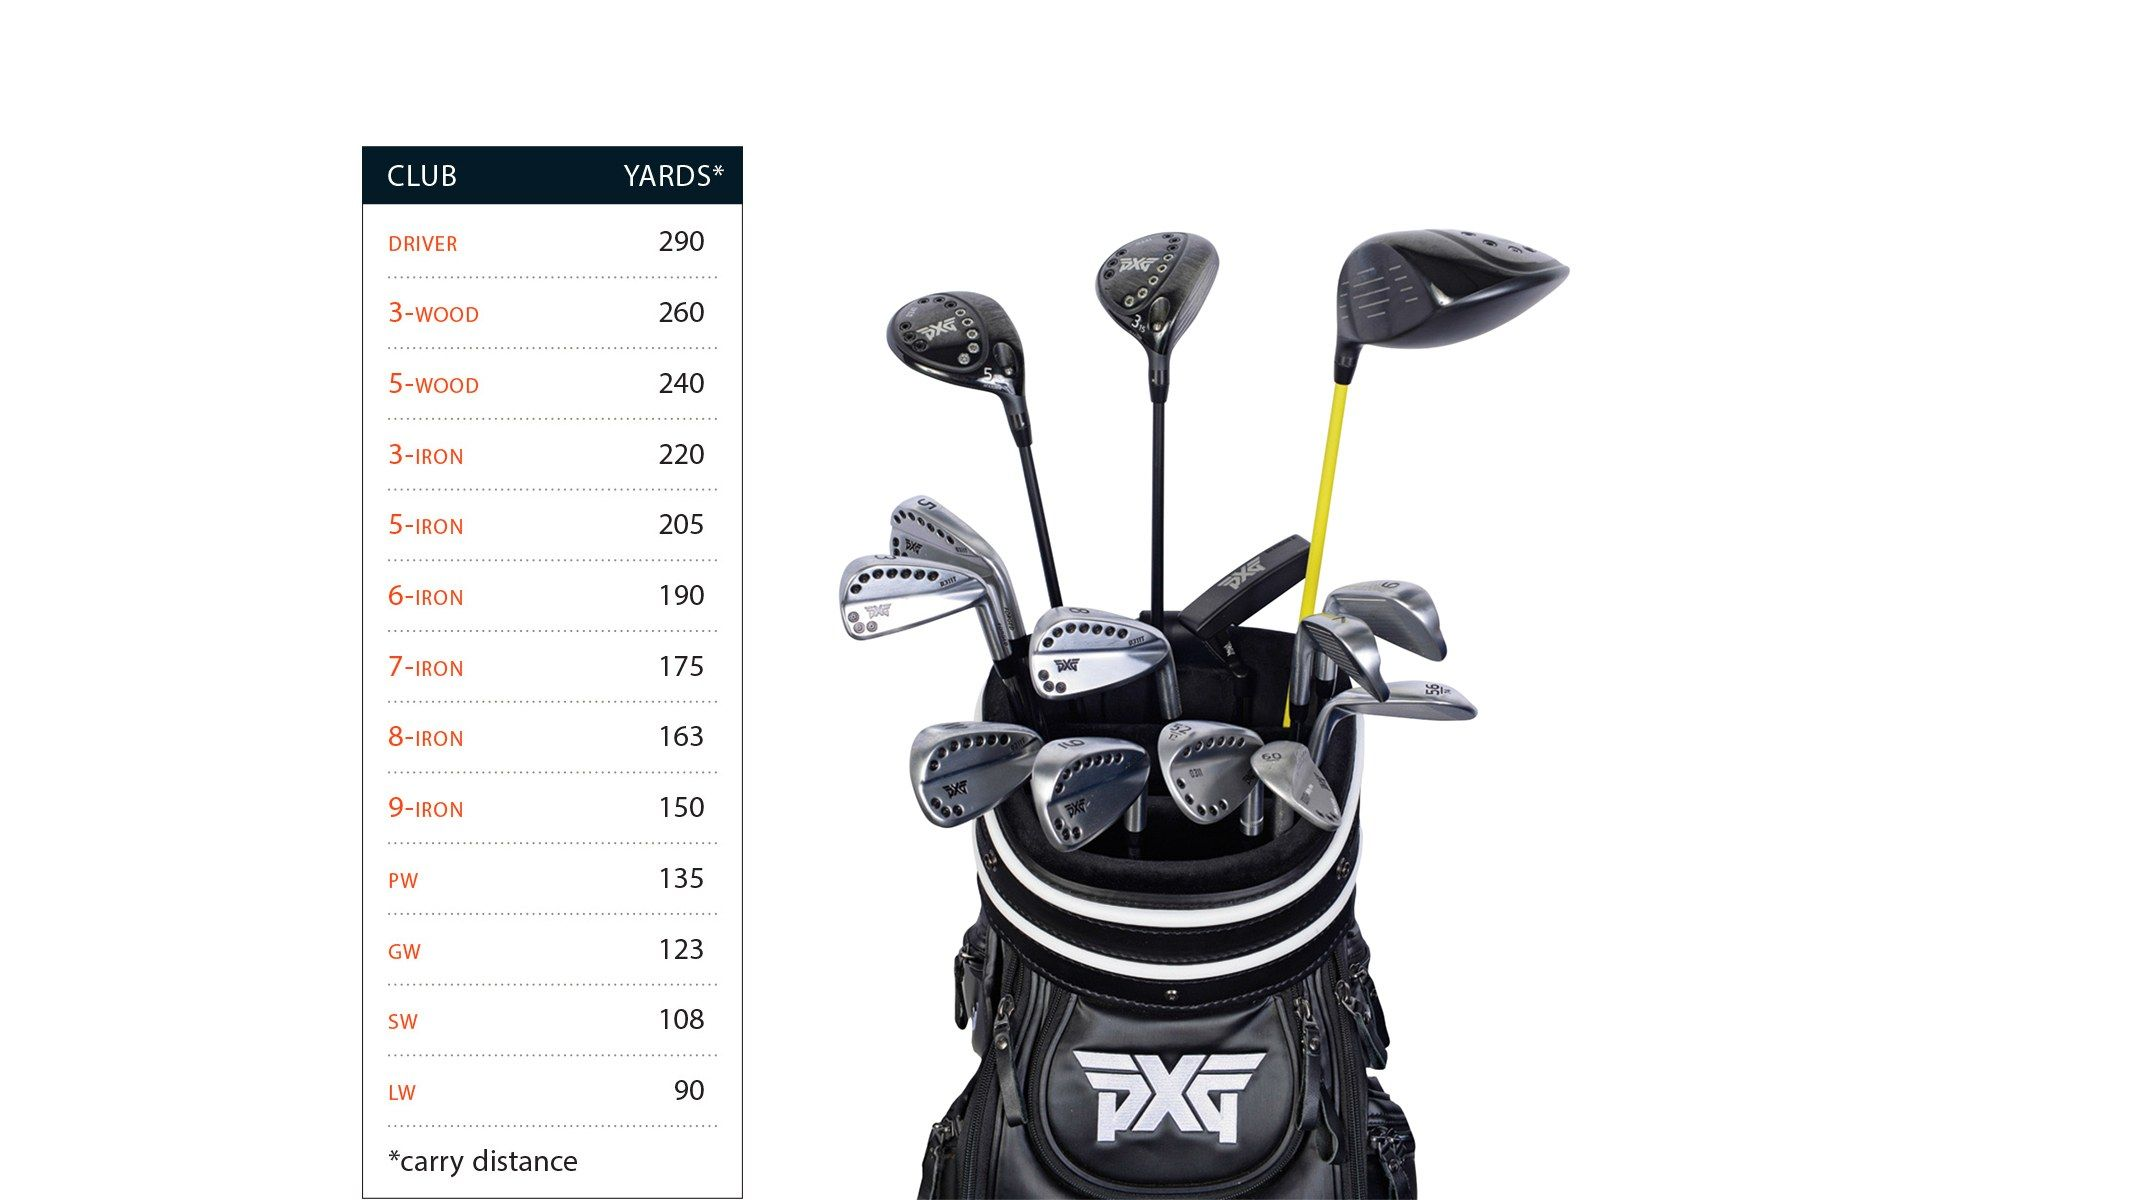 60f203f19c What's In My Bag: Billy Horschel Photos - Golf Digest | PXG | Golf ...